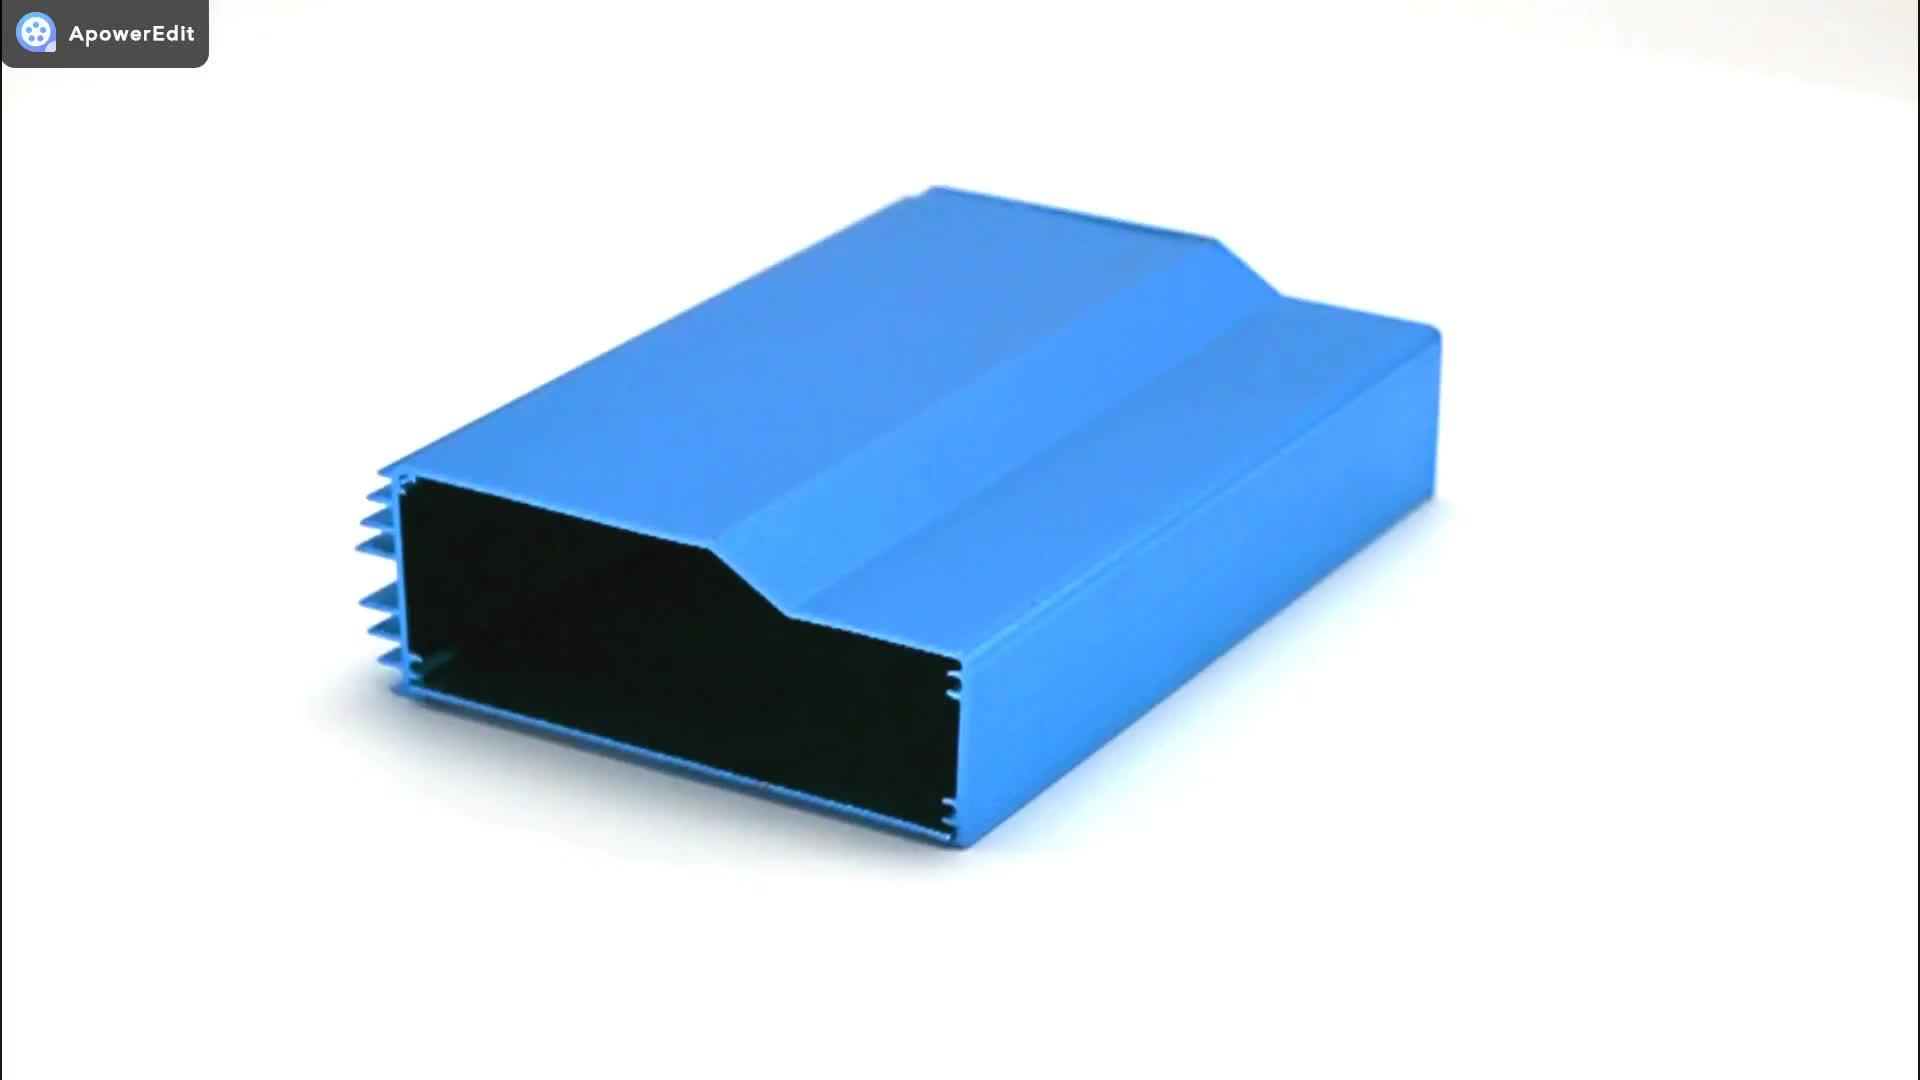 Su misura lengthweatherproof recinto elettronico per hdd